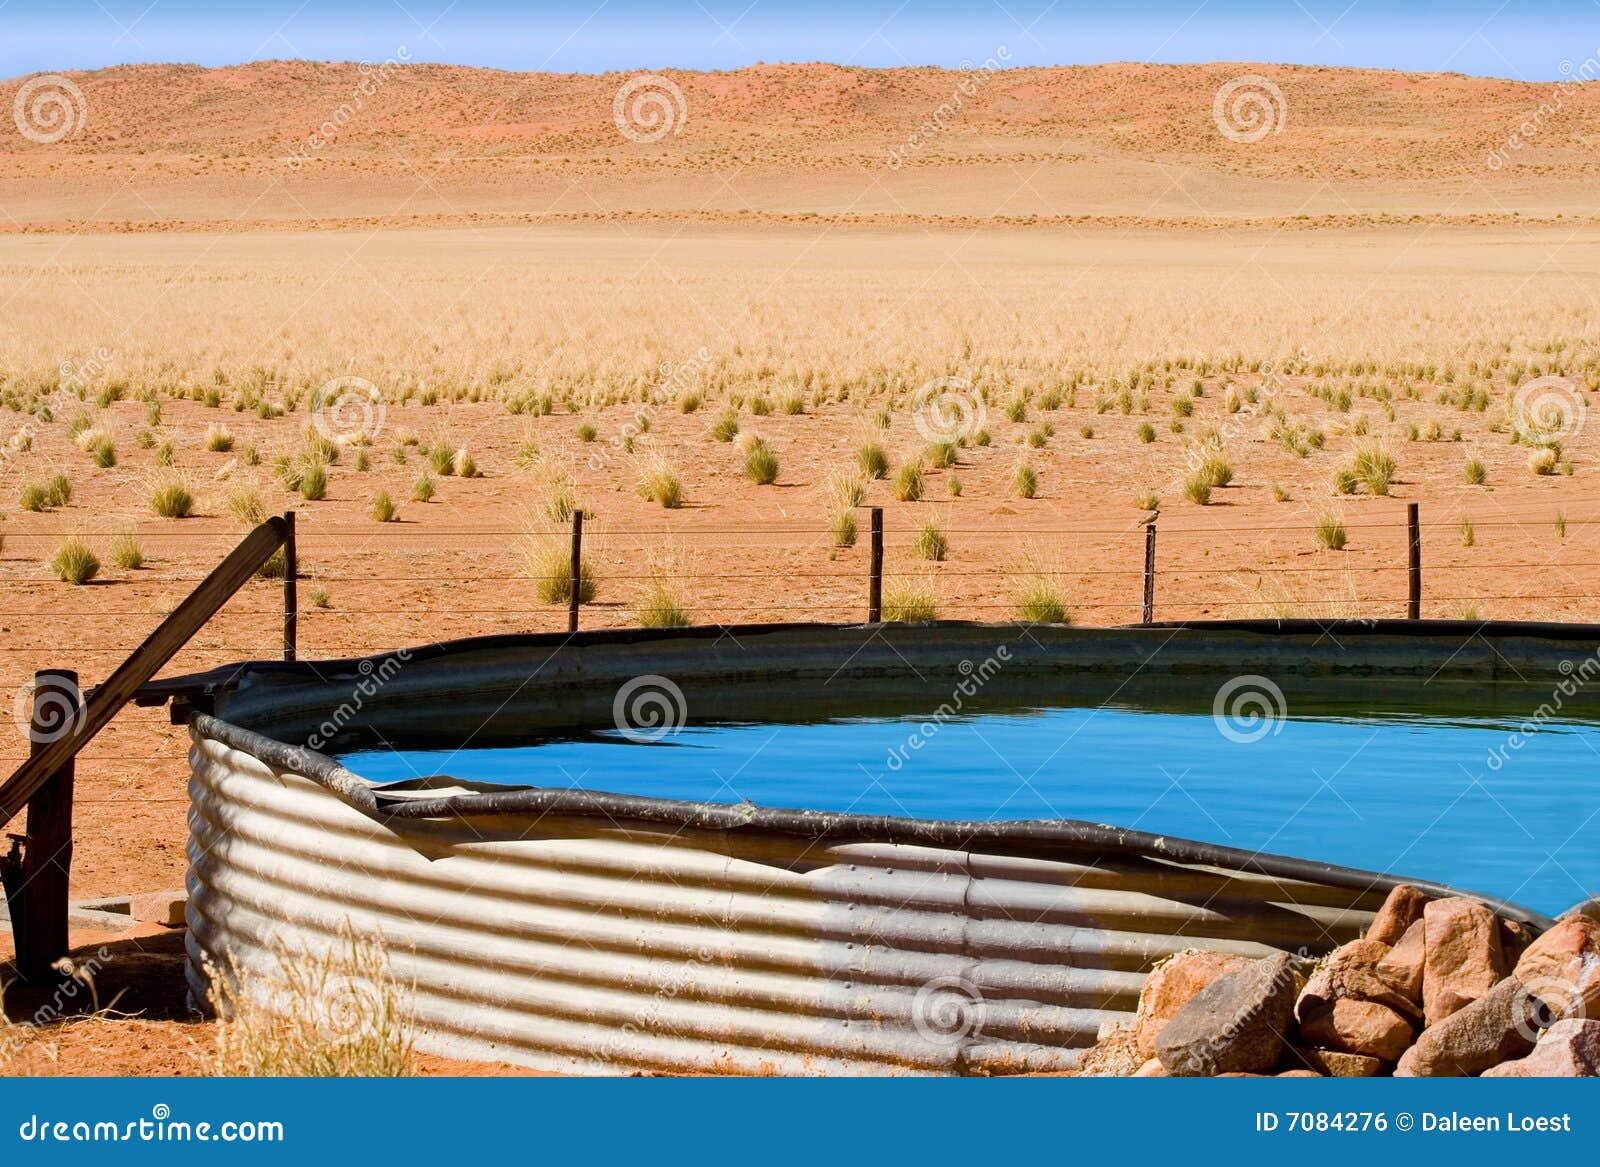 Corrugated Iron Dam On Desert Farm Royalty Free Stock